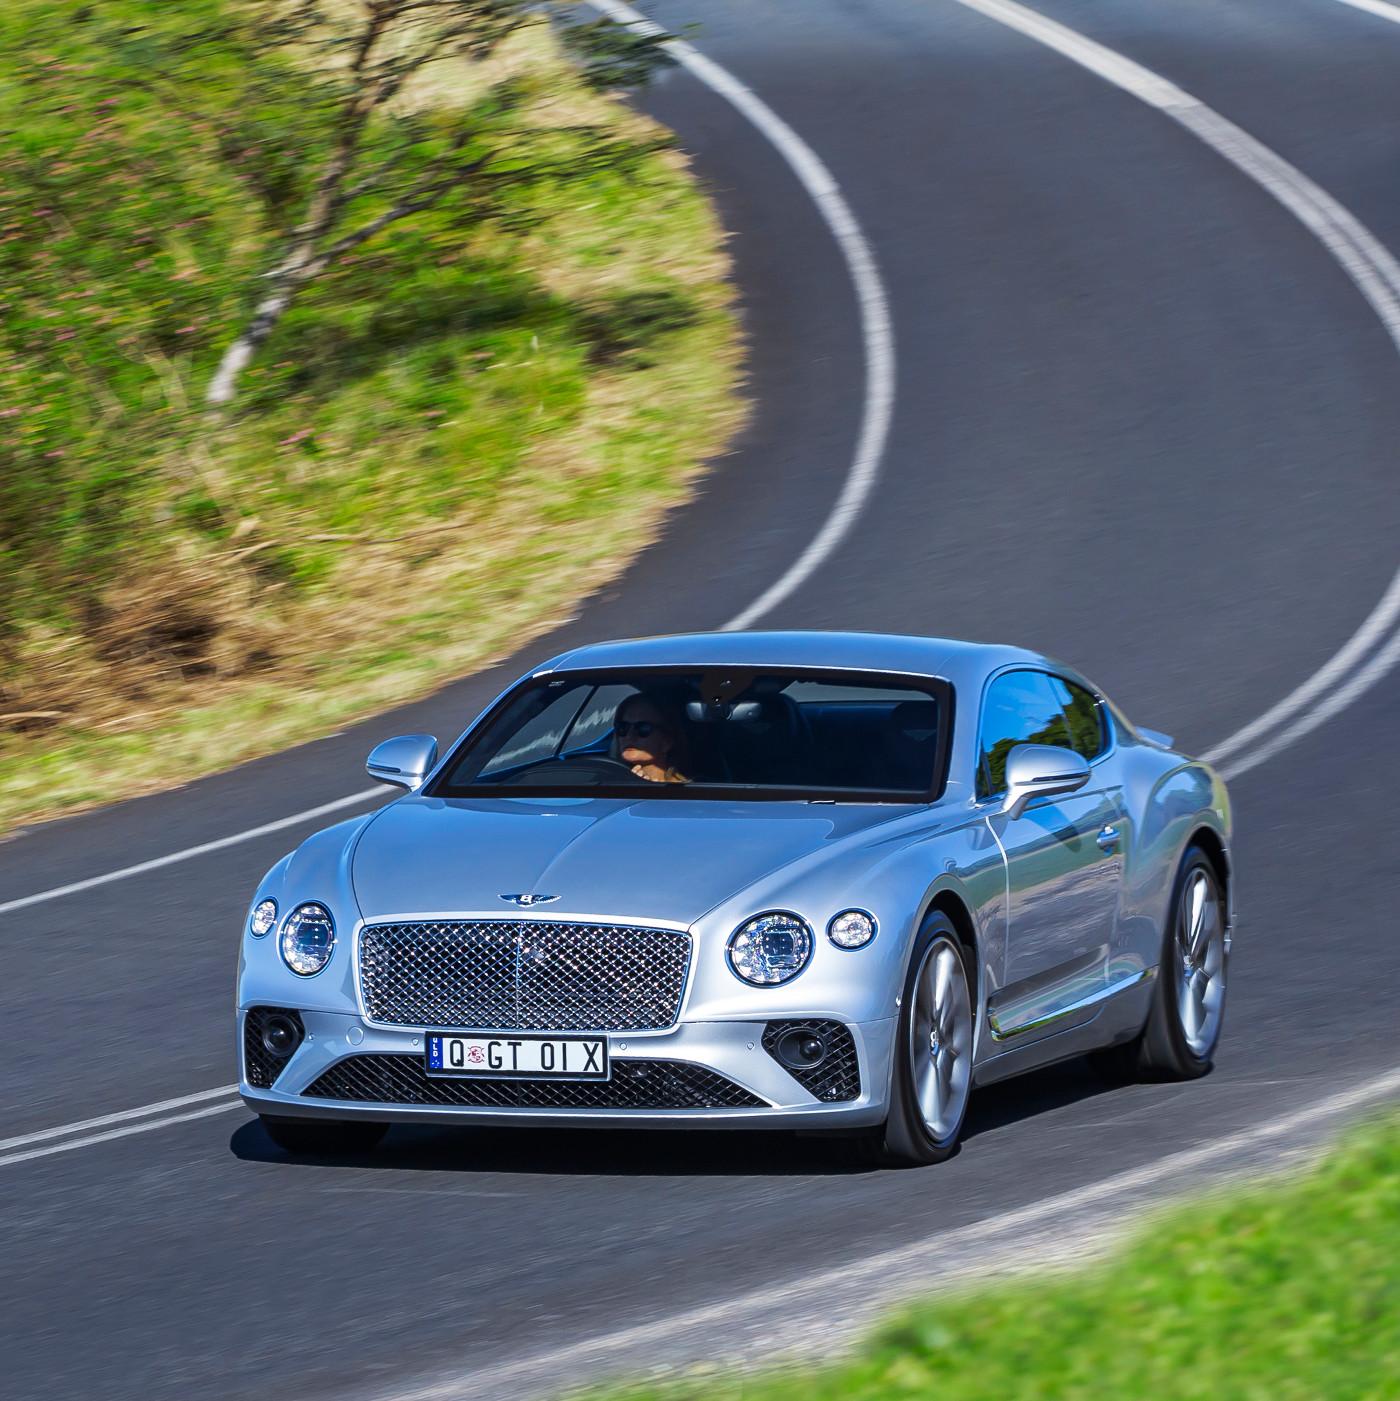 The Next-generation Bentley Continental GT